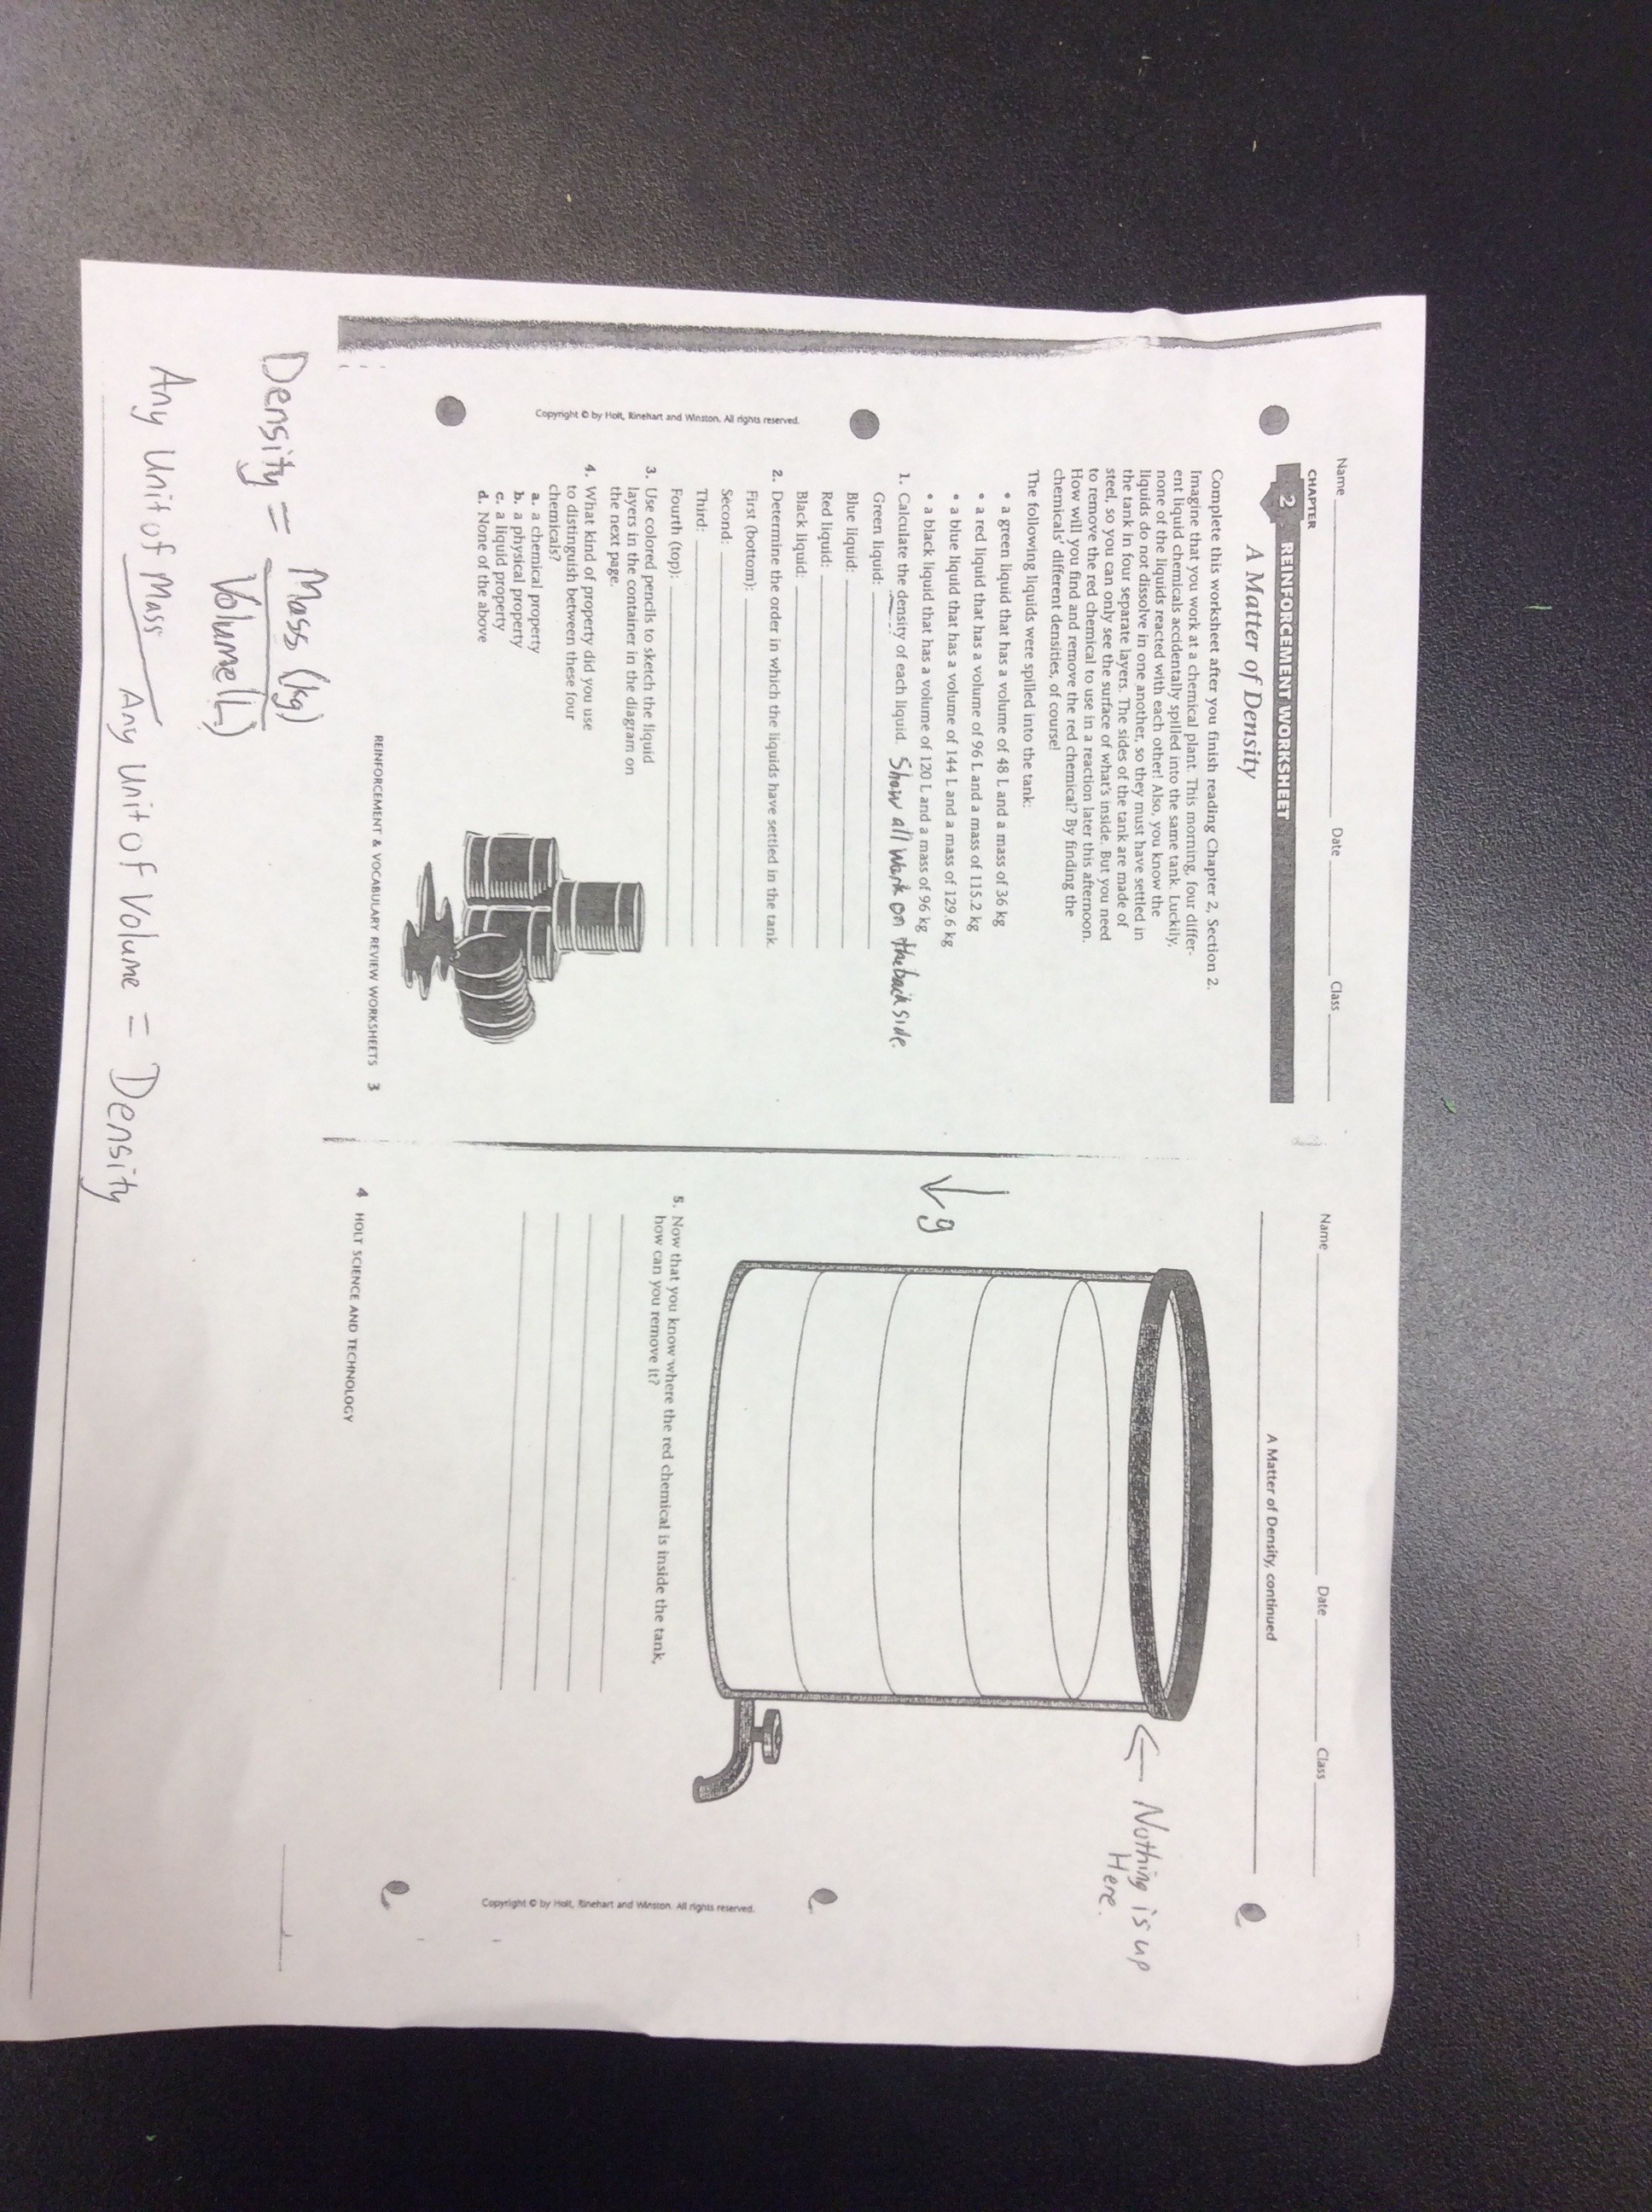 Density Worksheet Physical Science Interesting A Matter Of Density